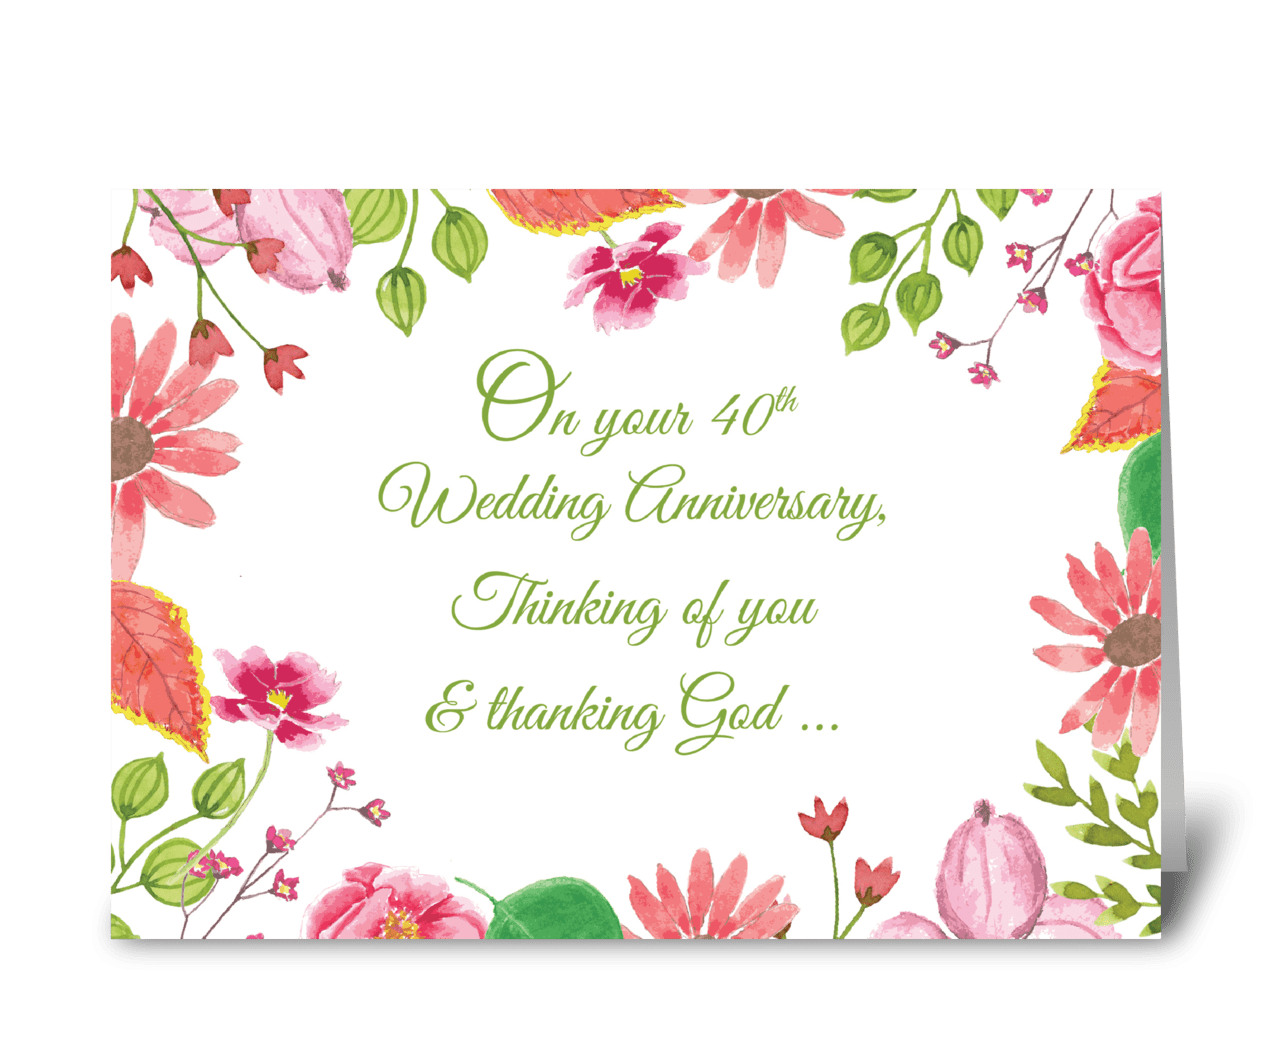 religious 40th wedding anniversary  send this greeting